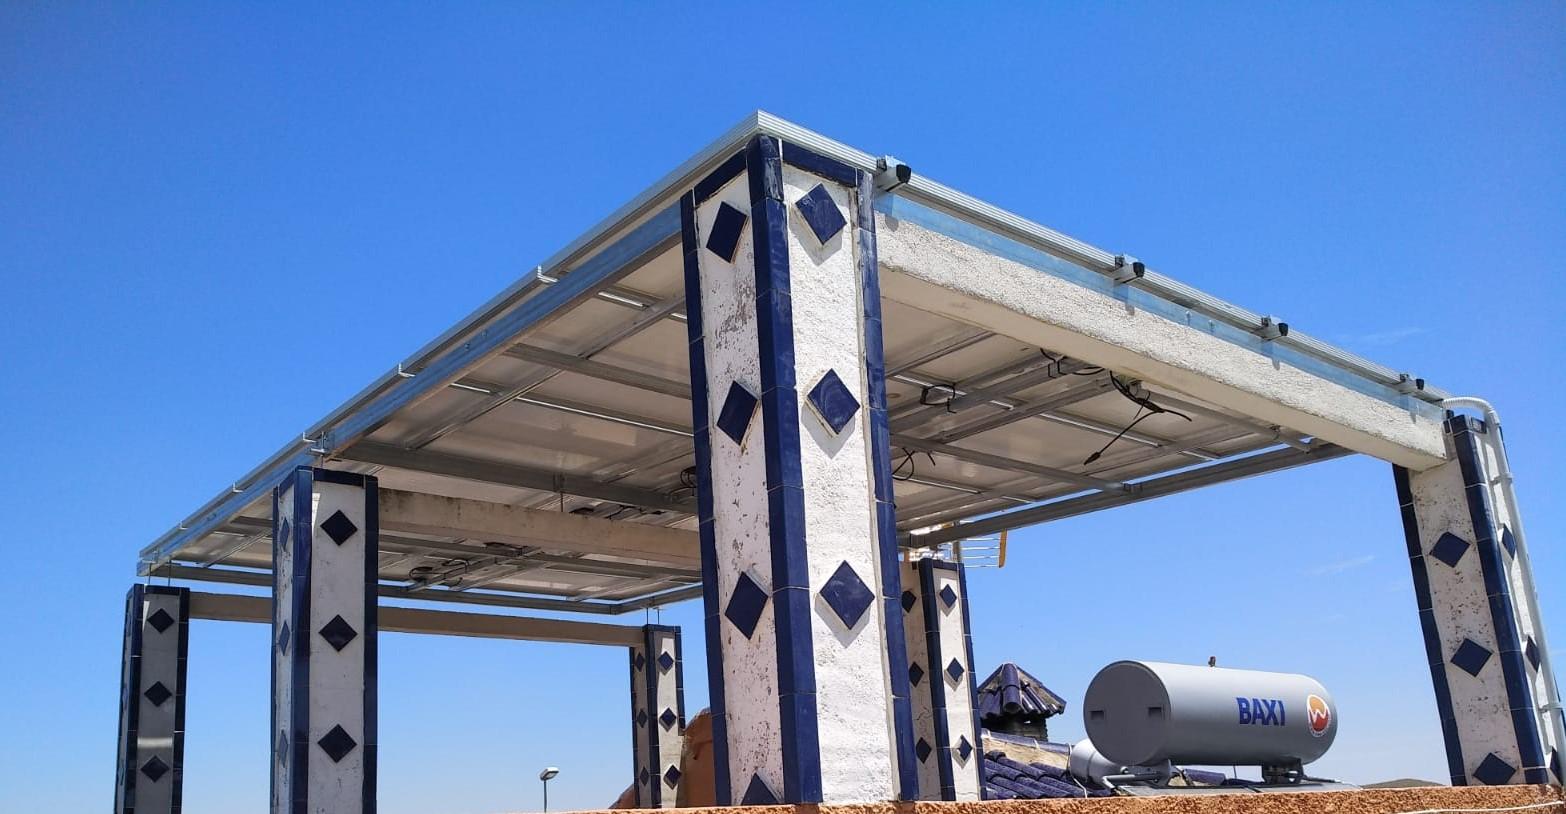 Panels created shade